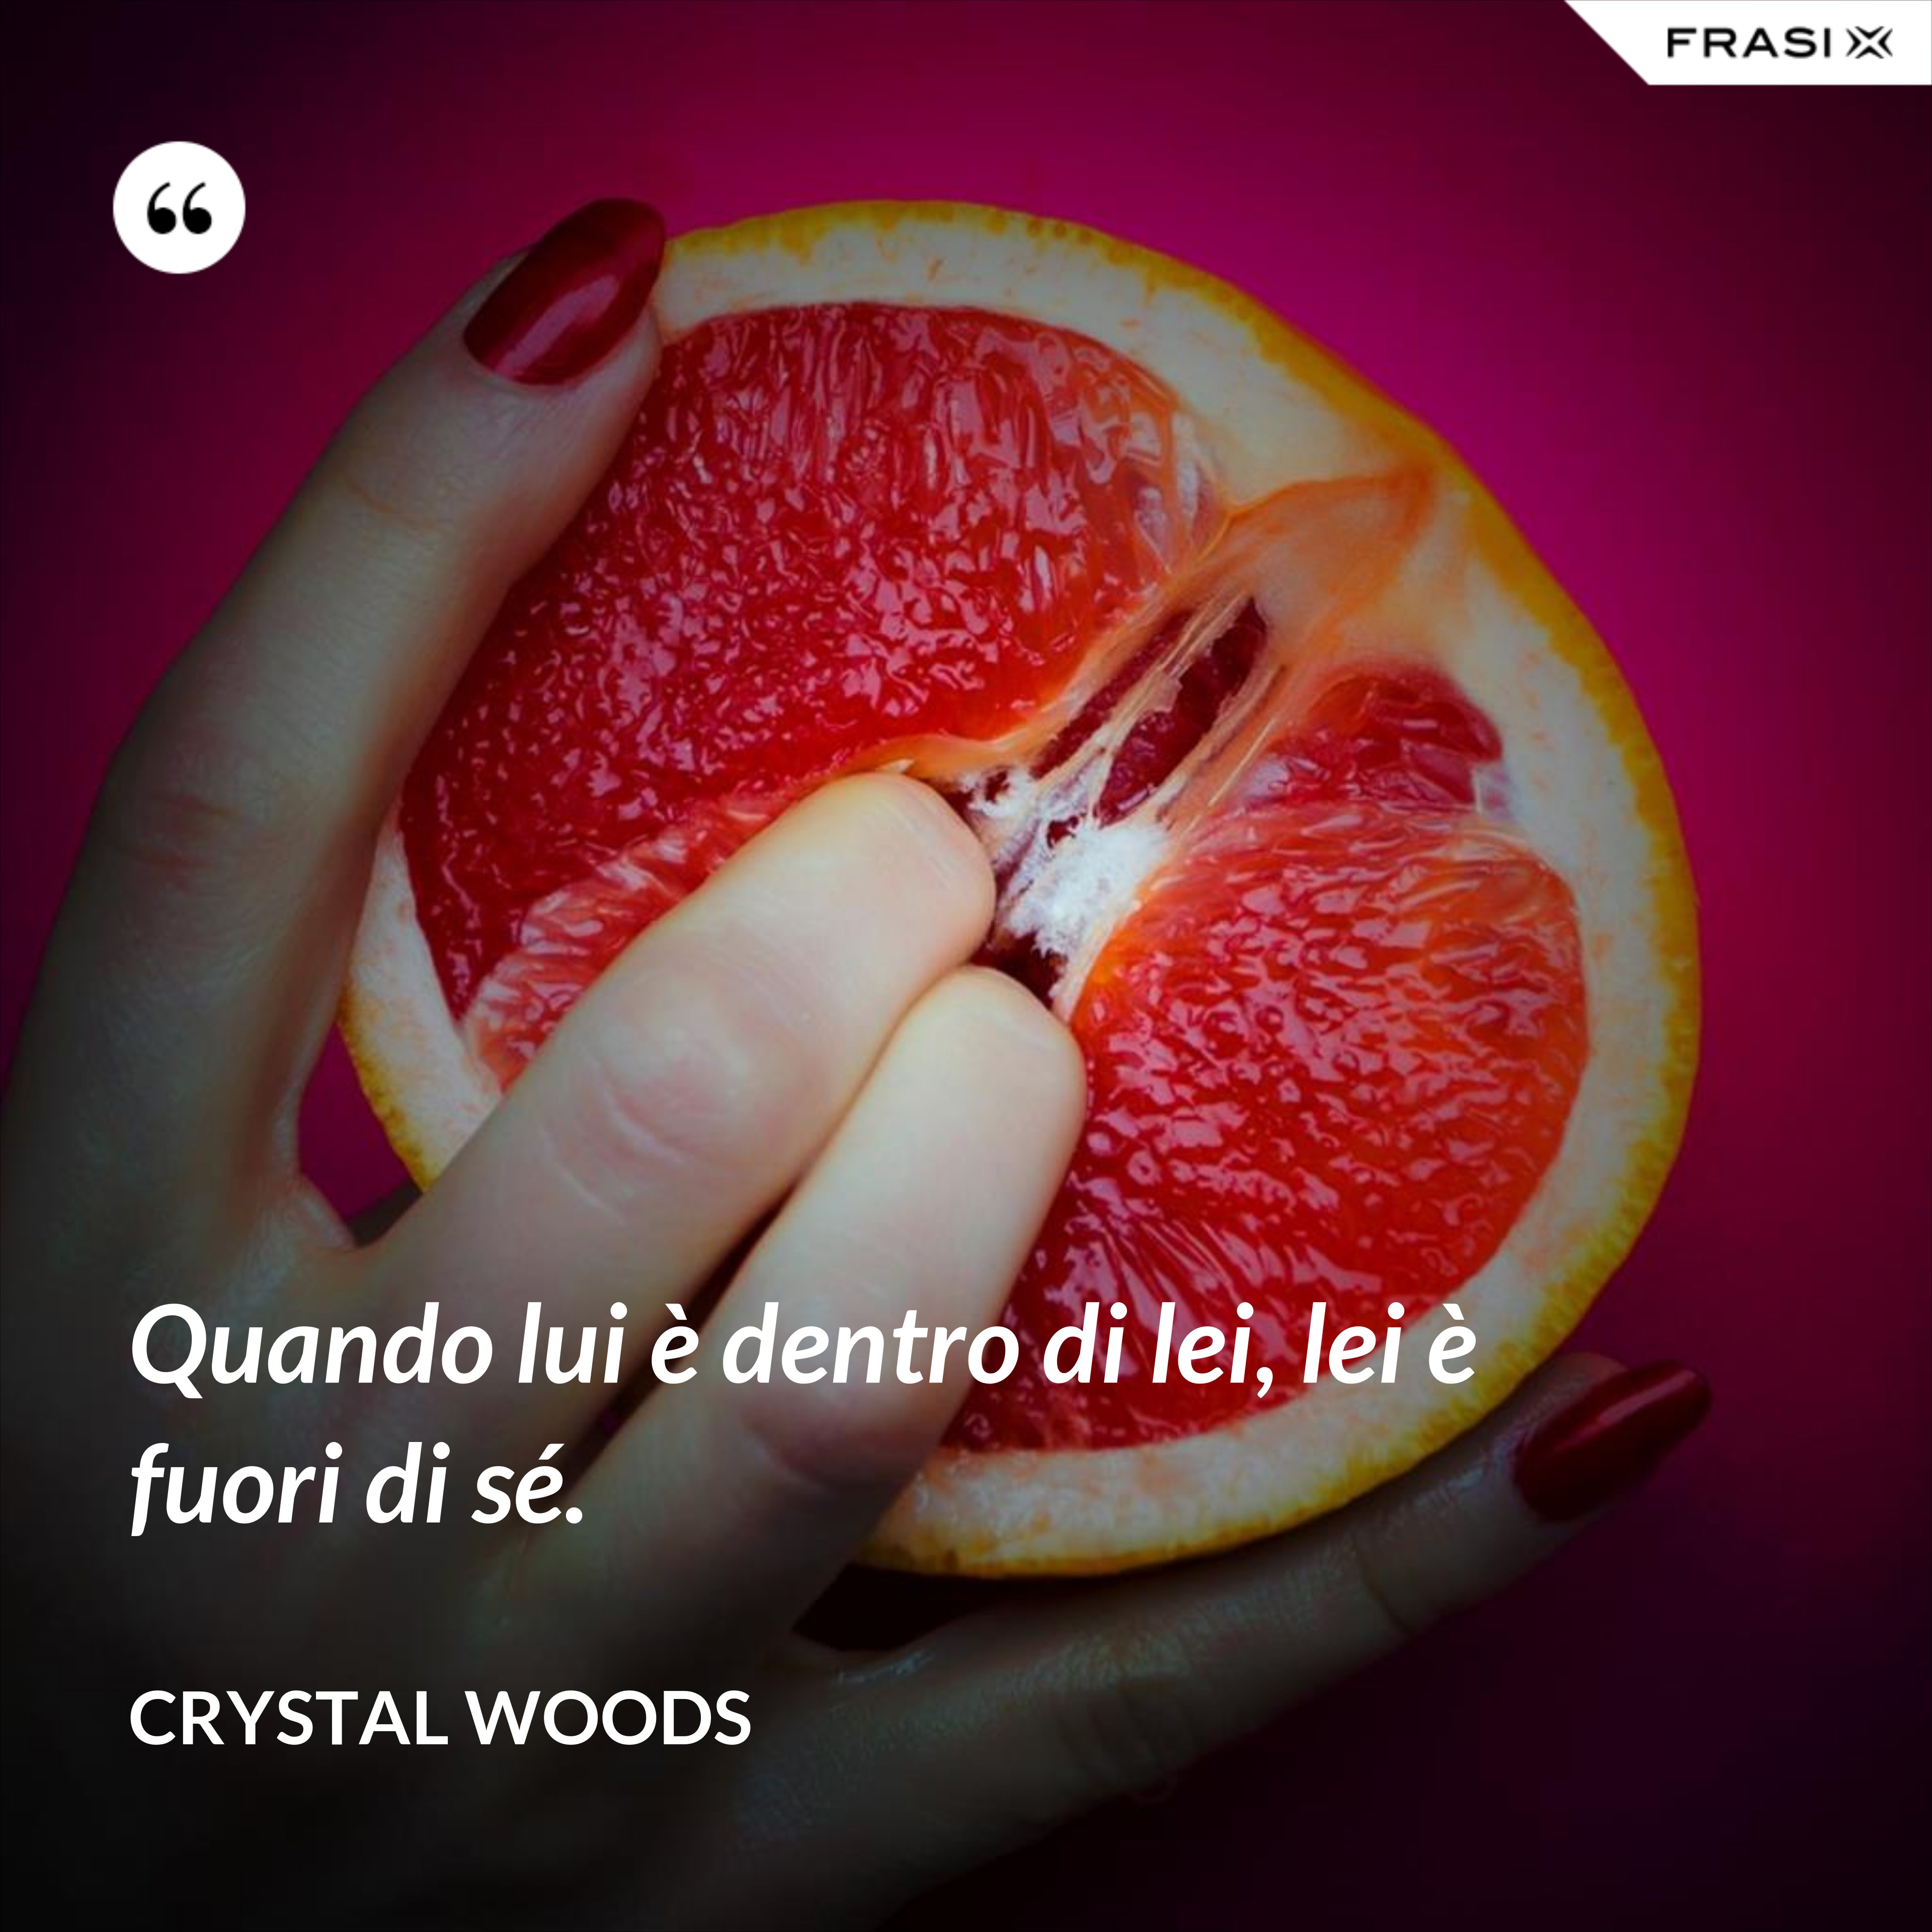 Quando lui è dentro di lei, lei è fuori di sé. - Crystal Woods